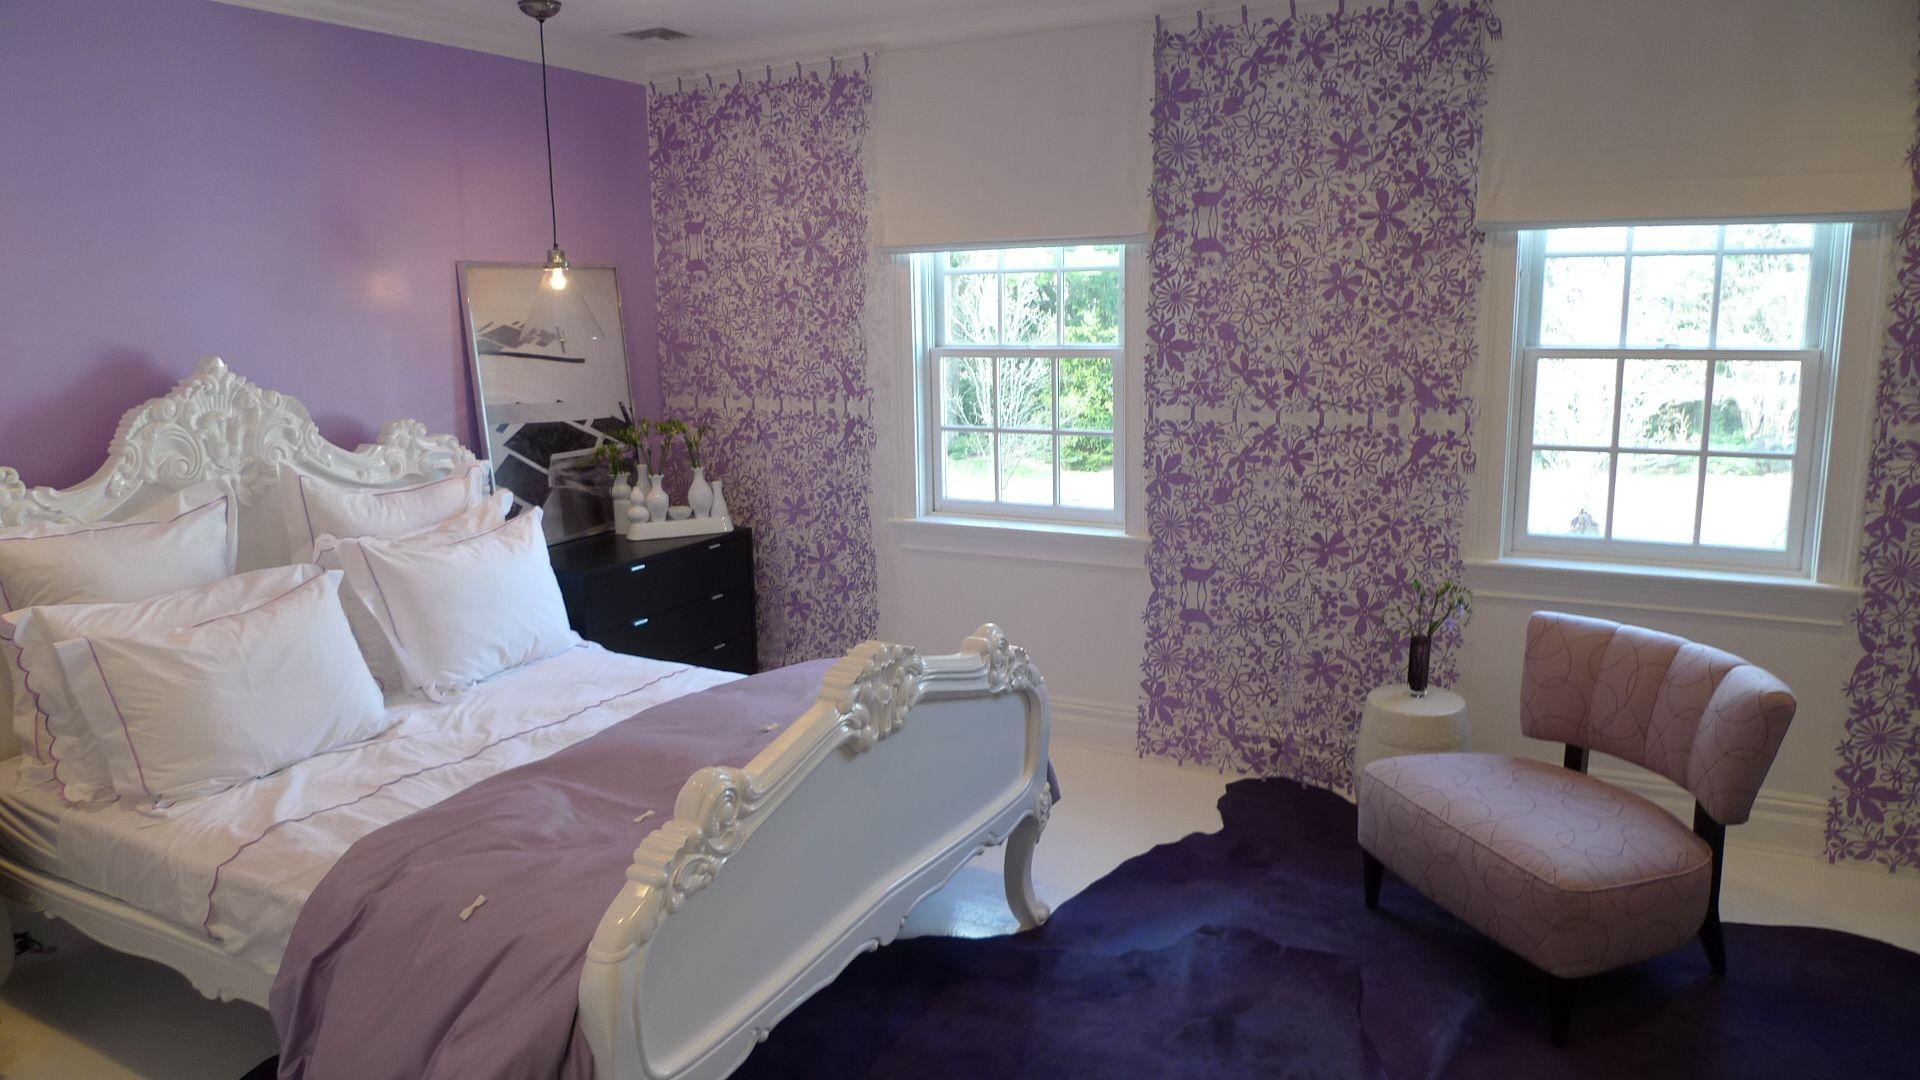 Lilly Wants A Lavender Room Purple Walls Light Purple Walls